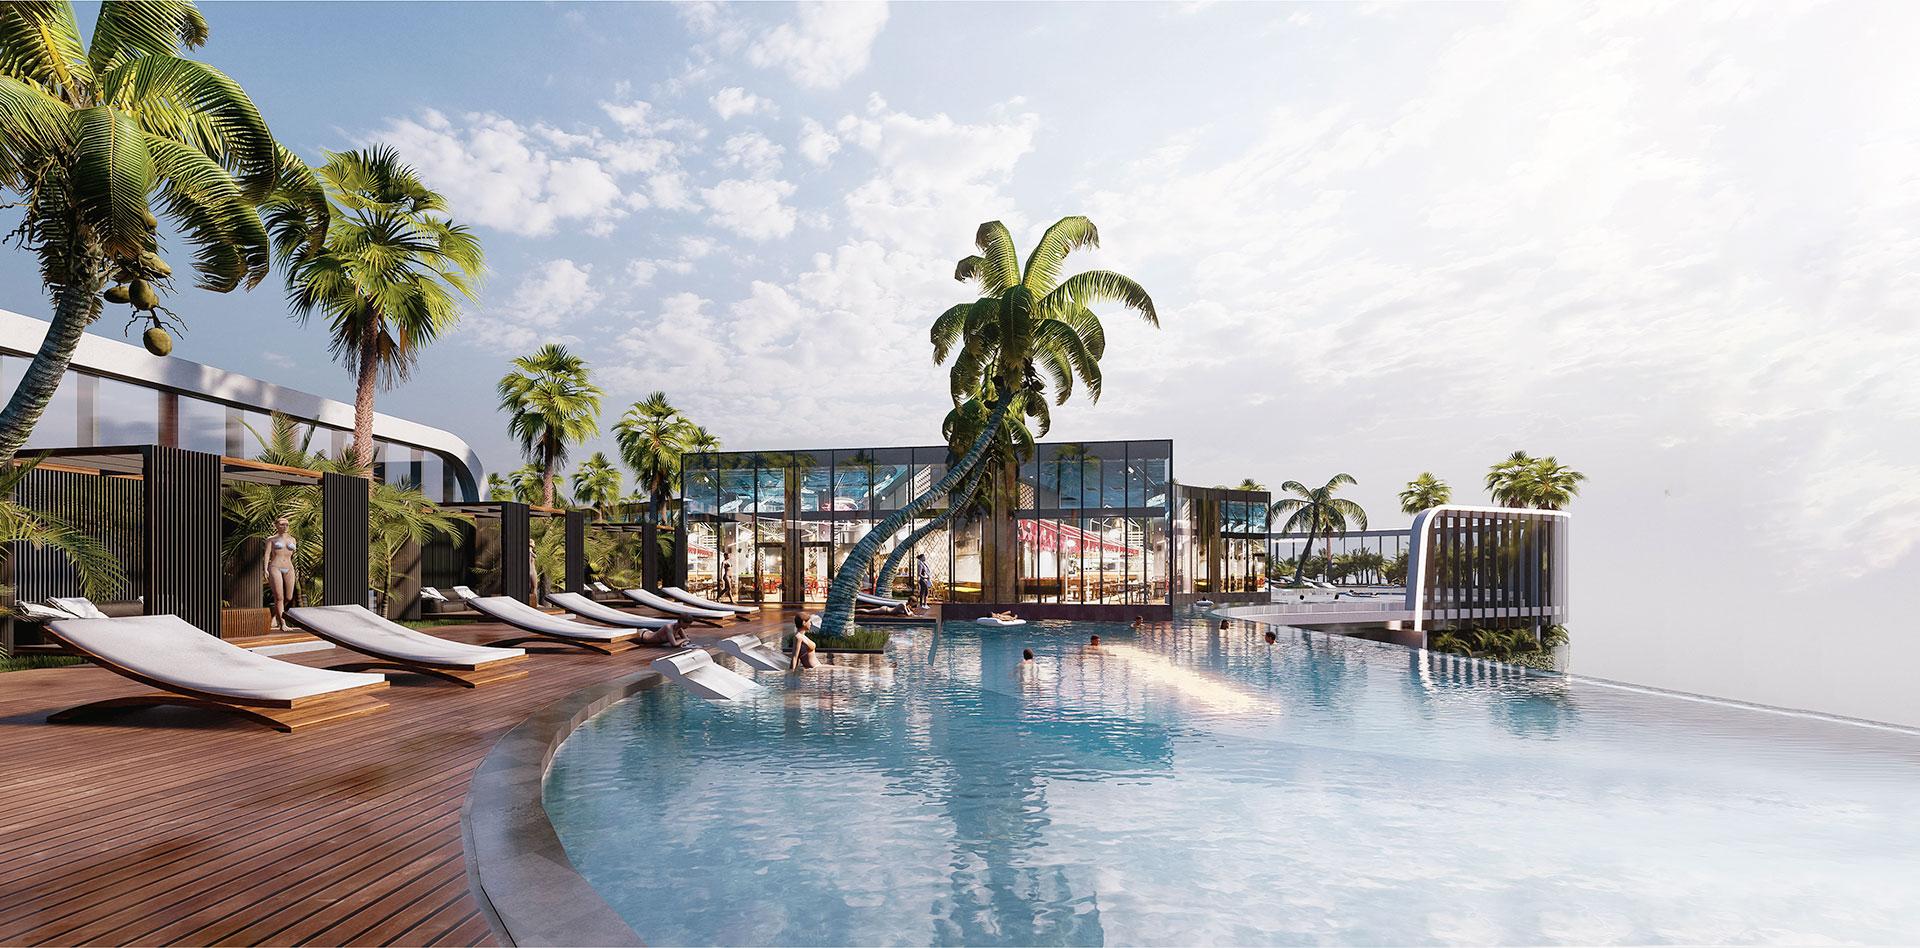 khu-nghi-duong-sinhthai-resort-2